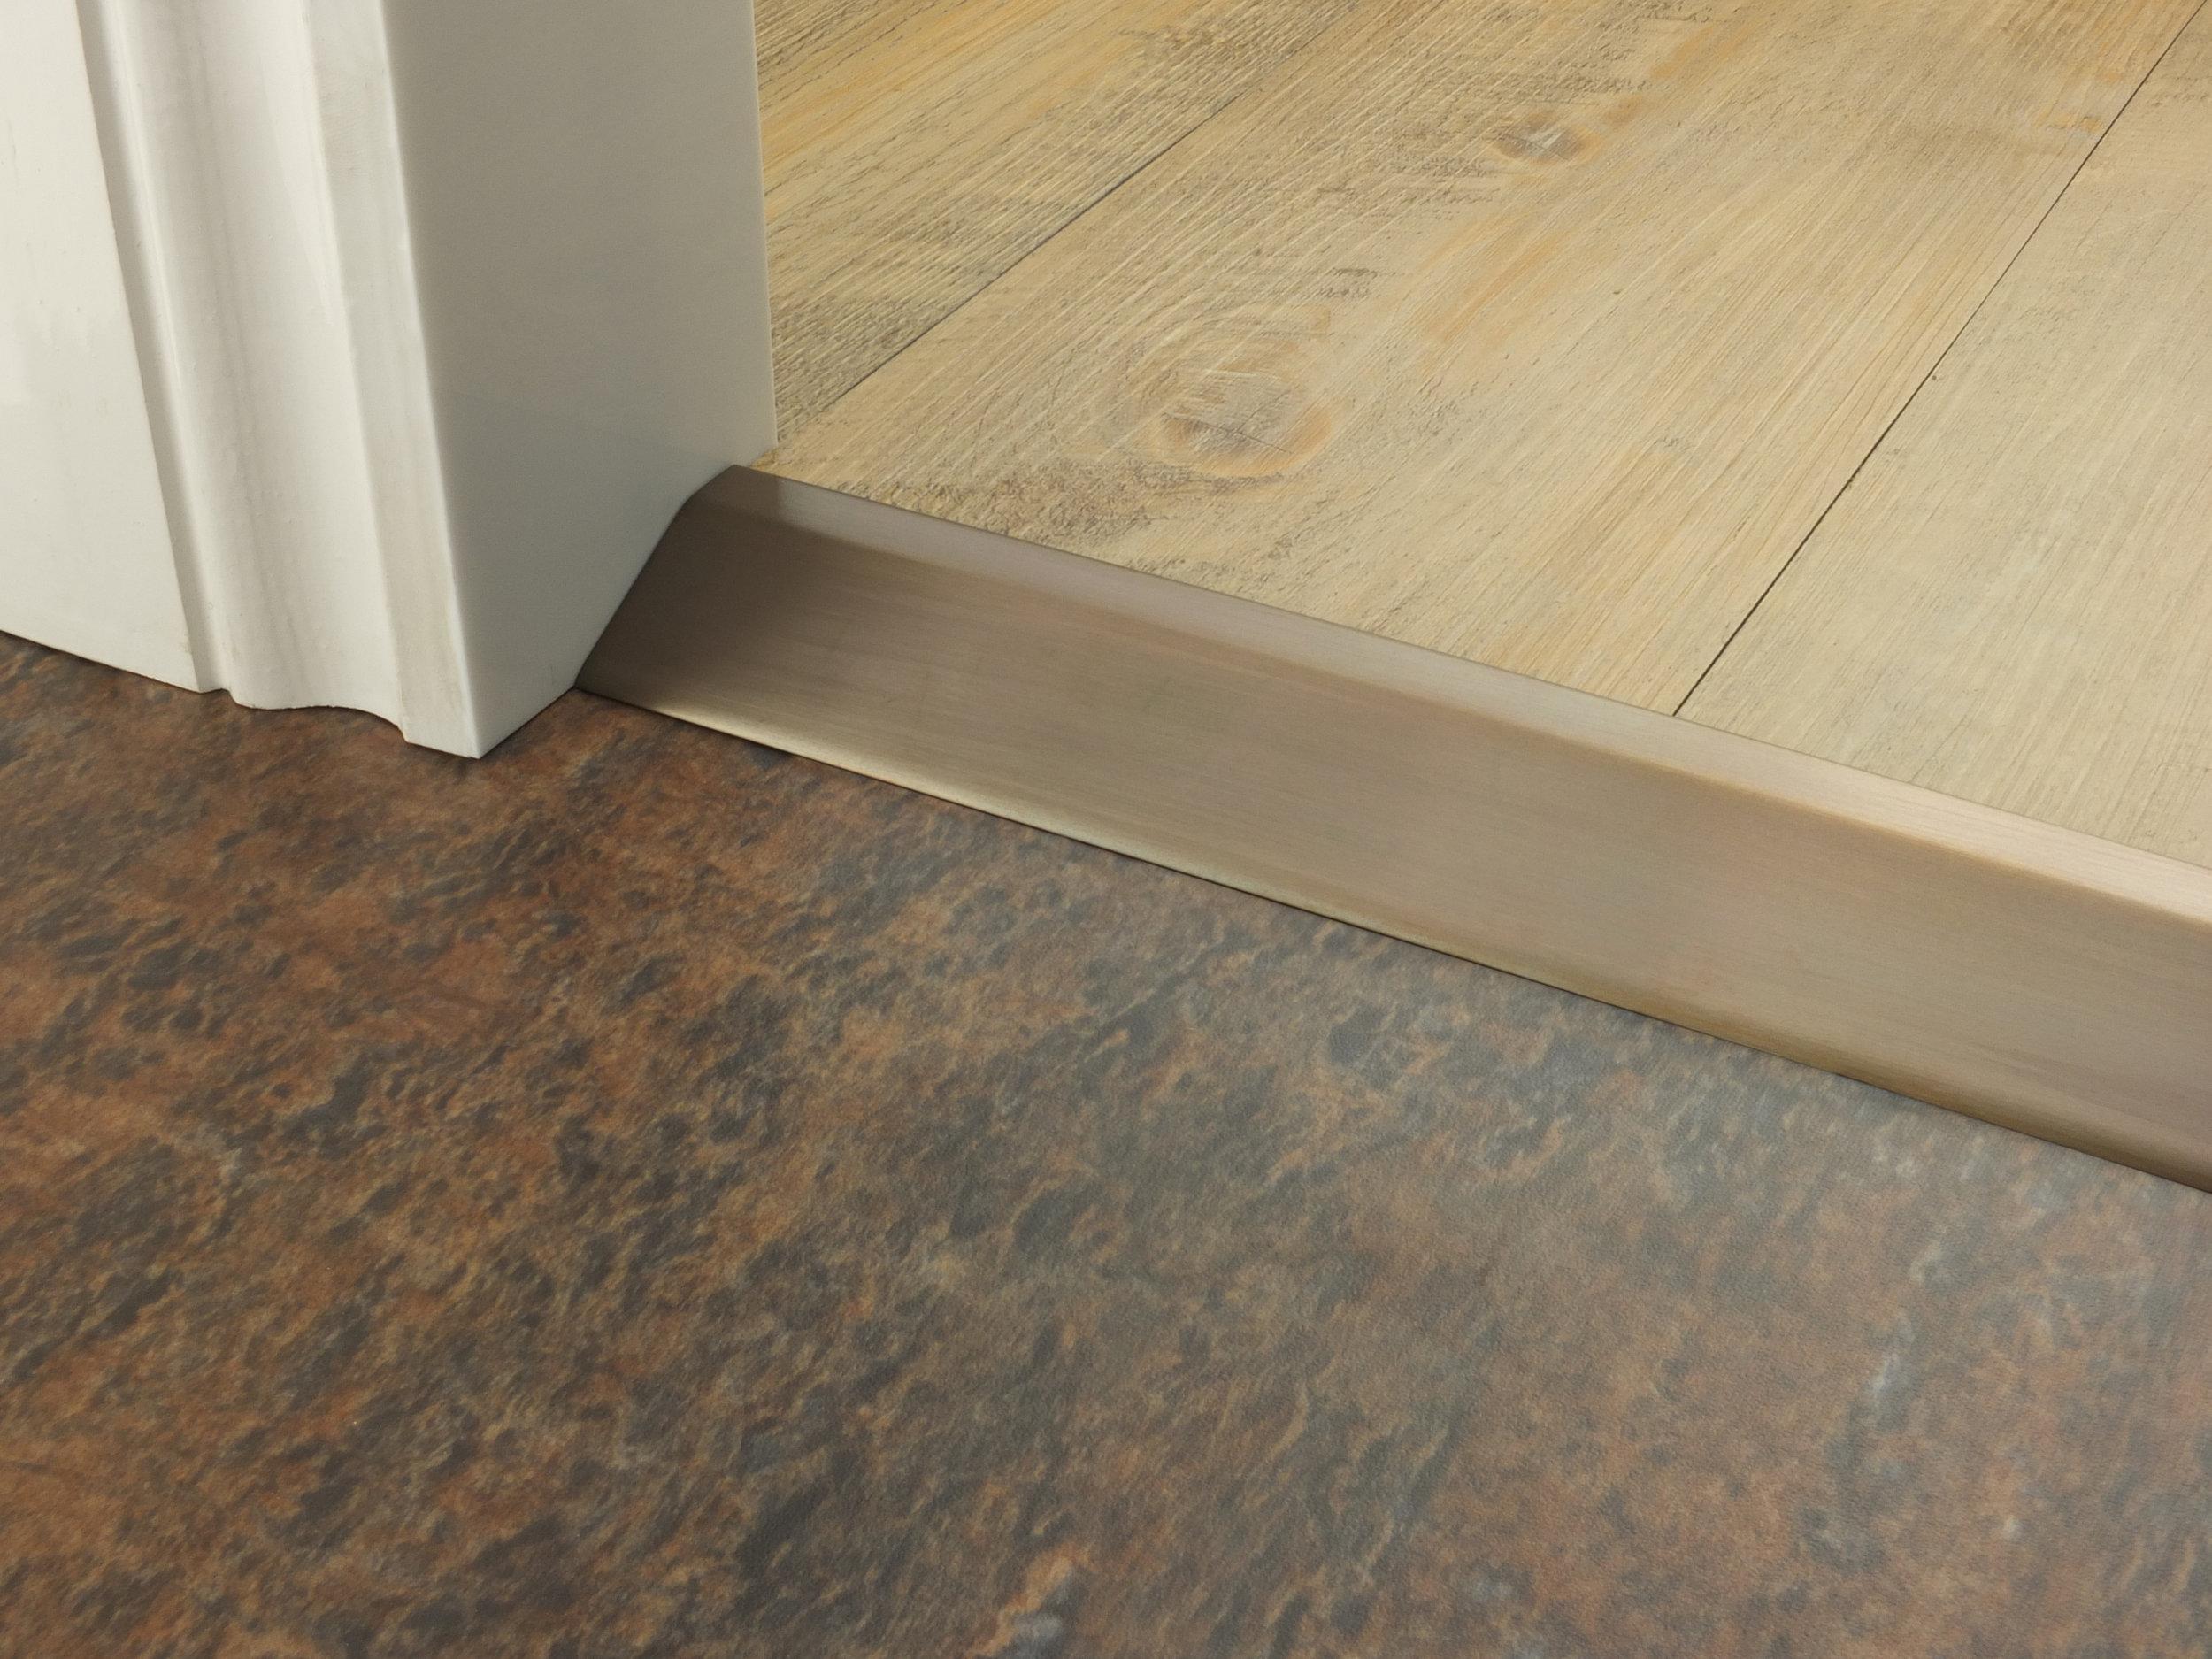 stairrods-doorbar-bronze-16mm-ramp.jpg